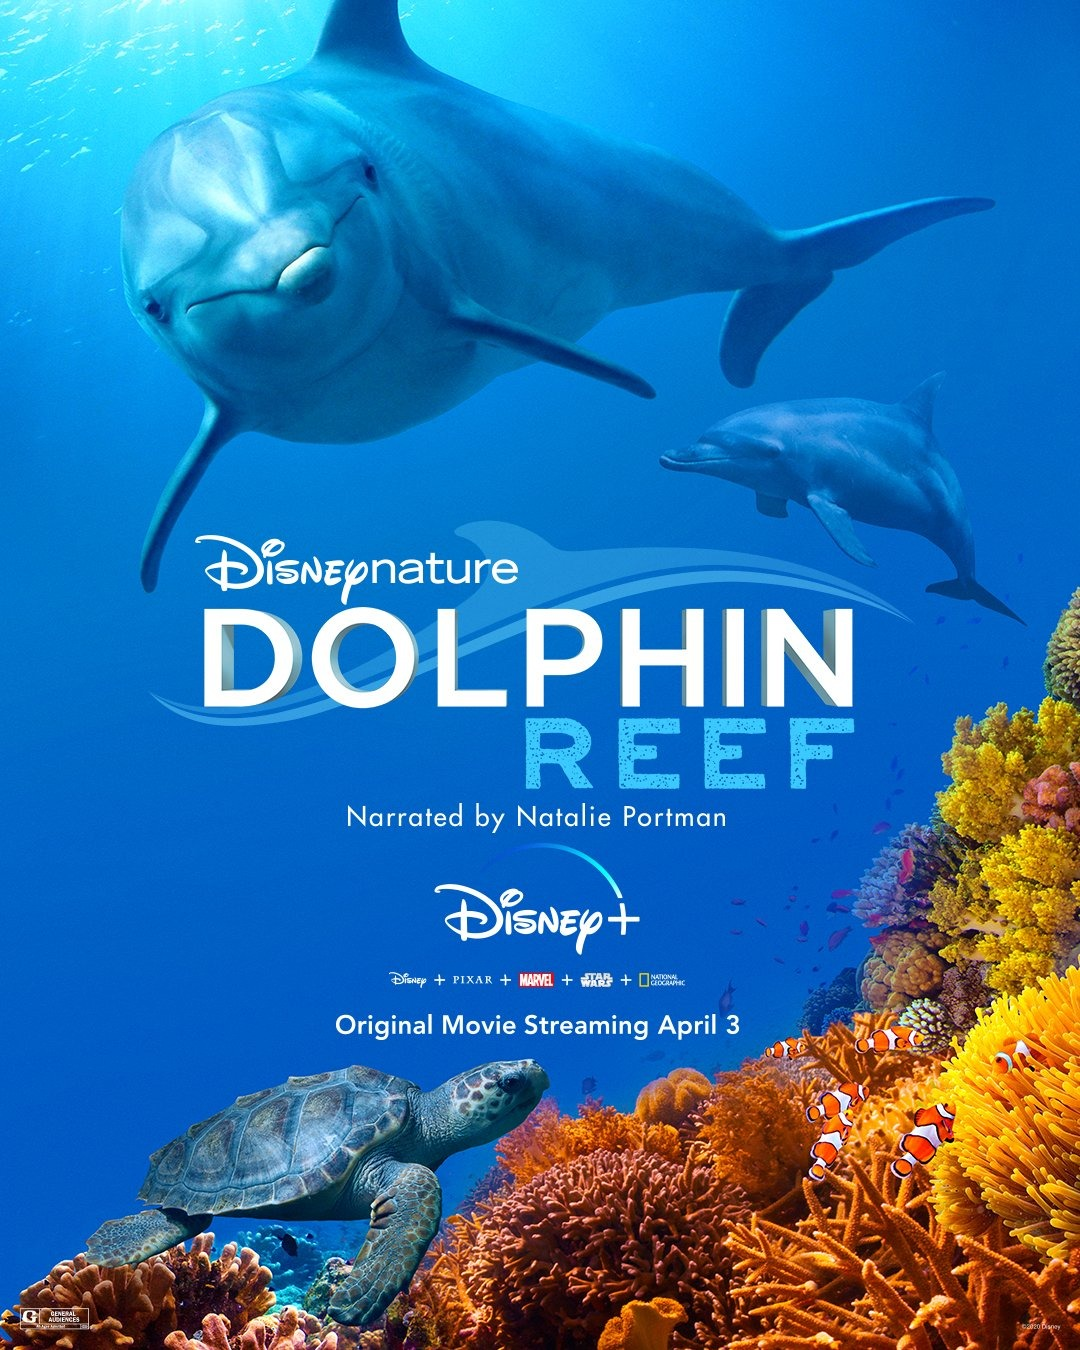 affiche dolphin reef disney+ disneynature